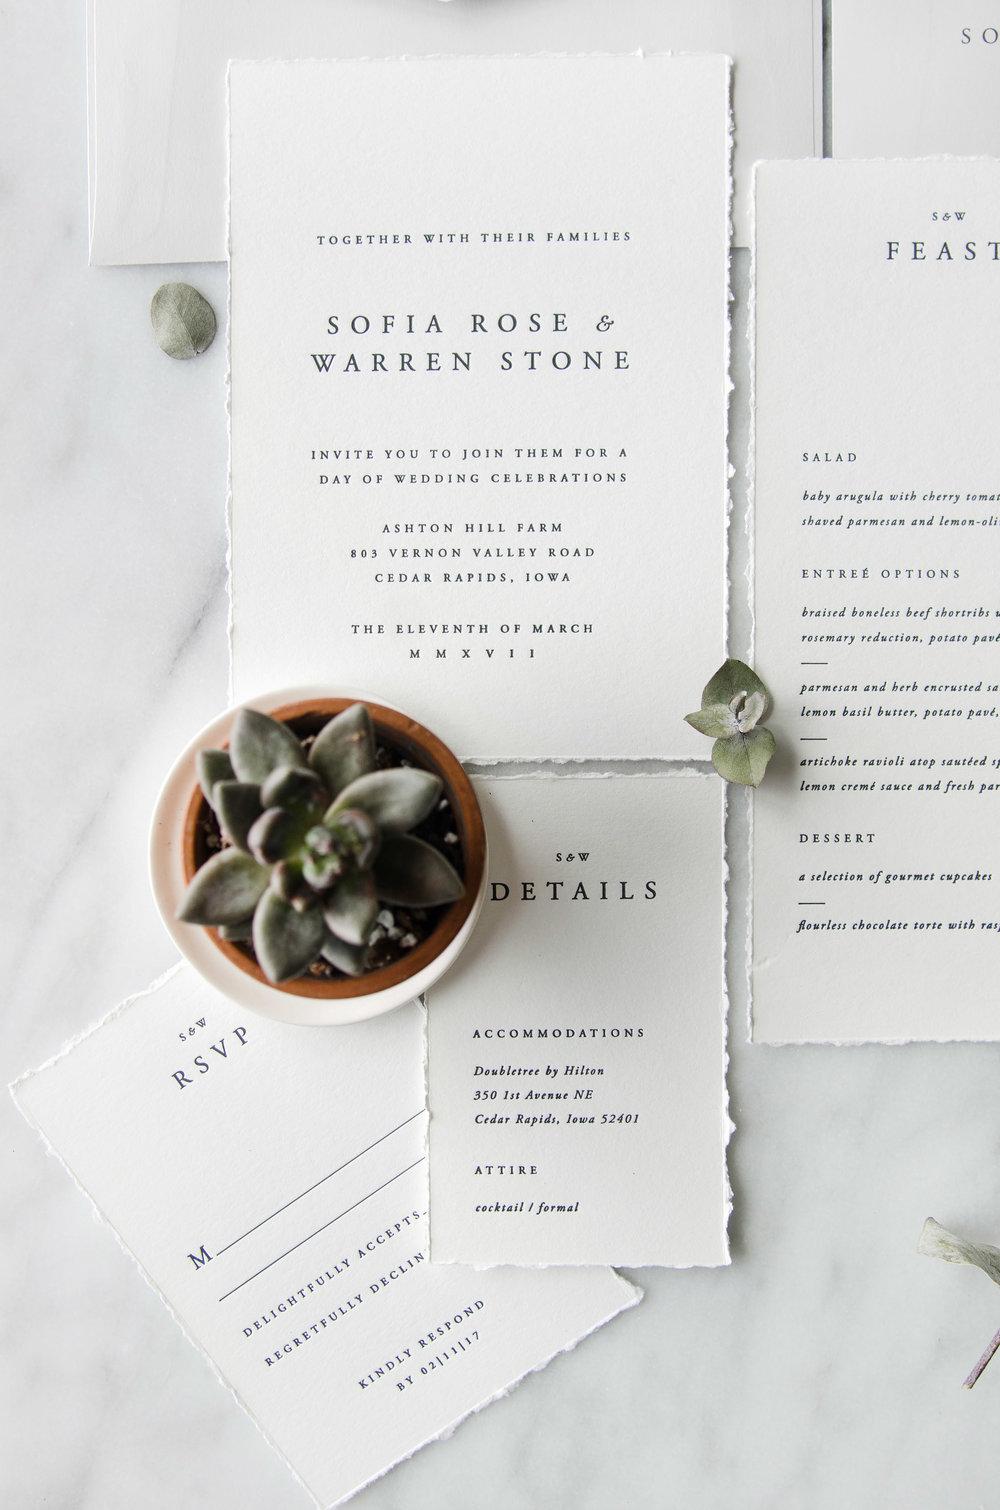 Sofia Semi-Custom Wedding Invitations